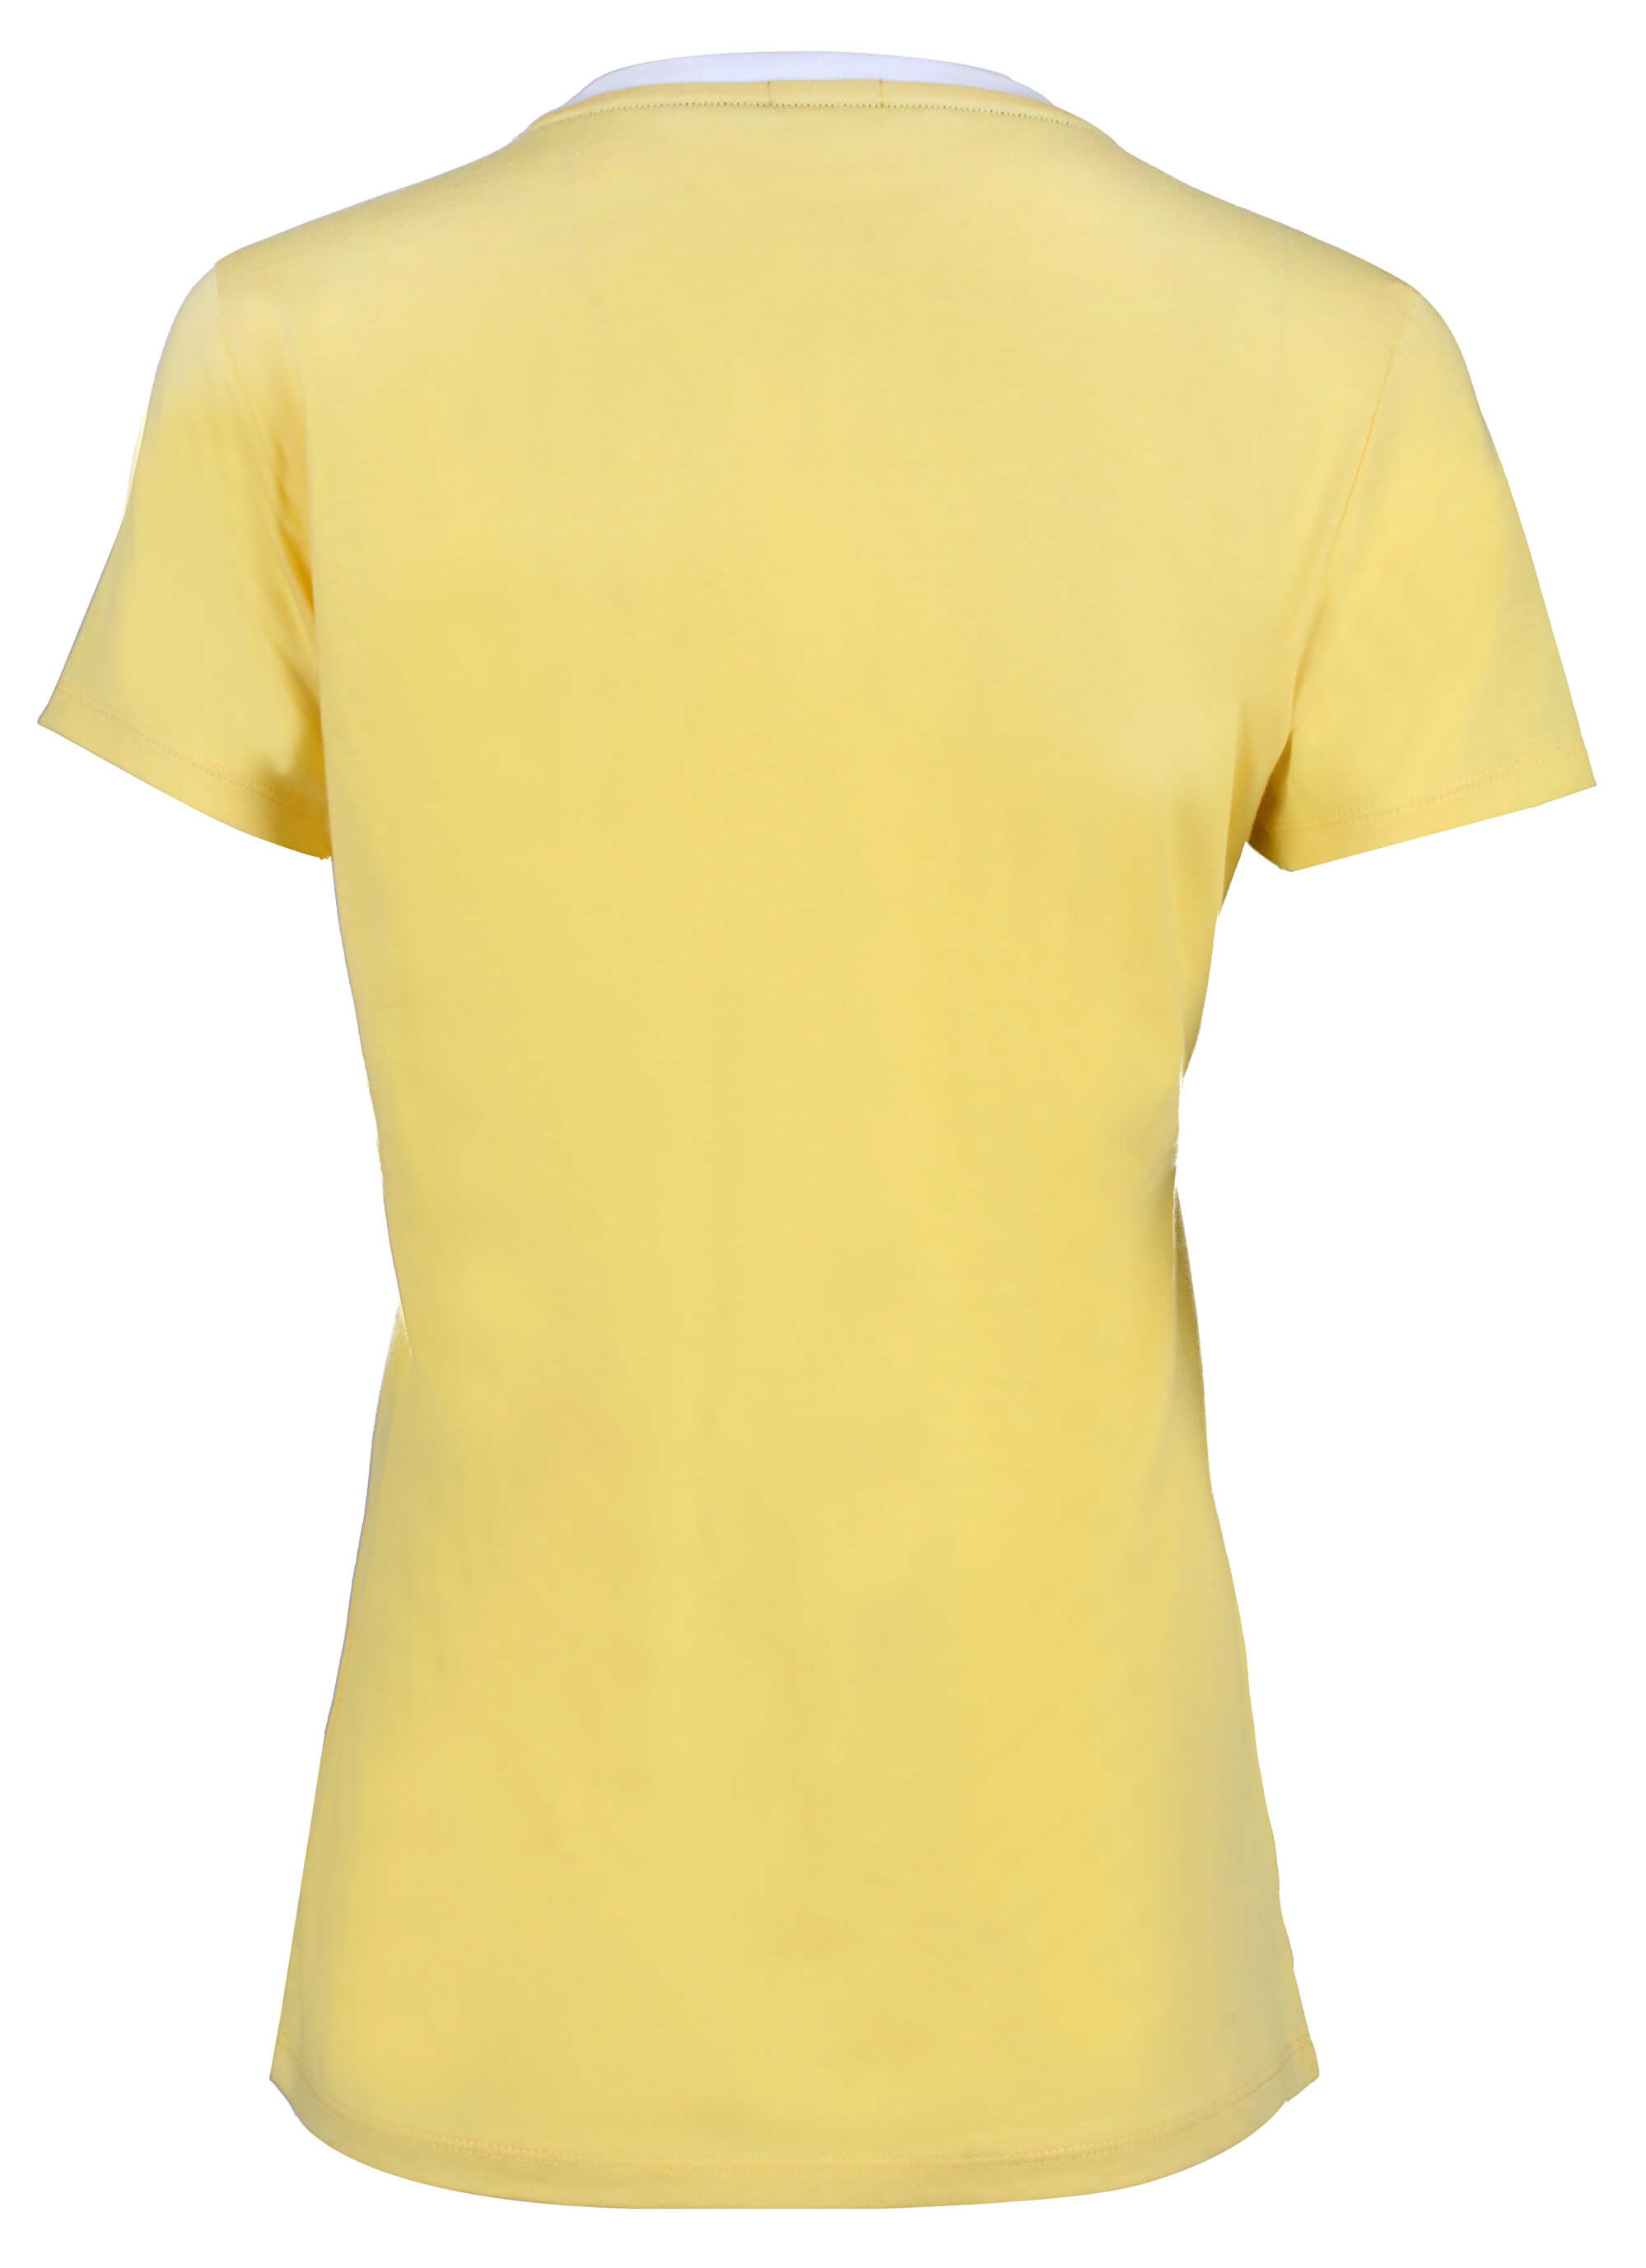 Tommy Hilfiger Dámské triko Ss Tee Print Yellow Cream UW0UW00091-708.  Předchozí  Další   981258674b7